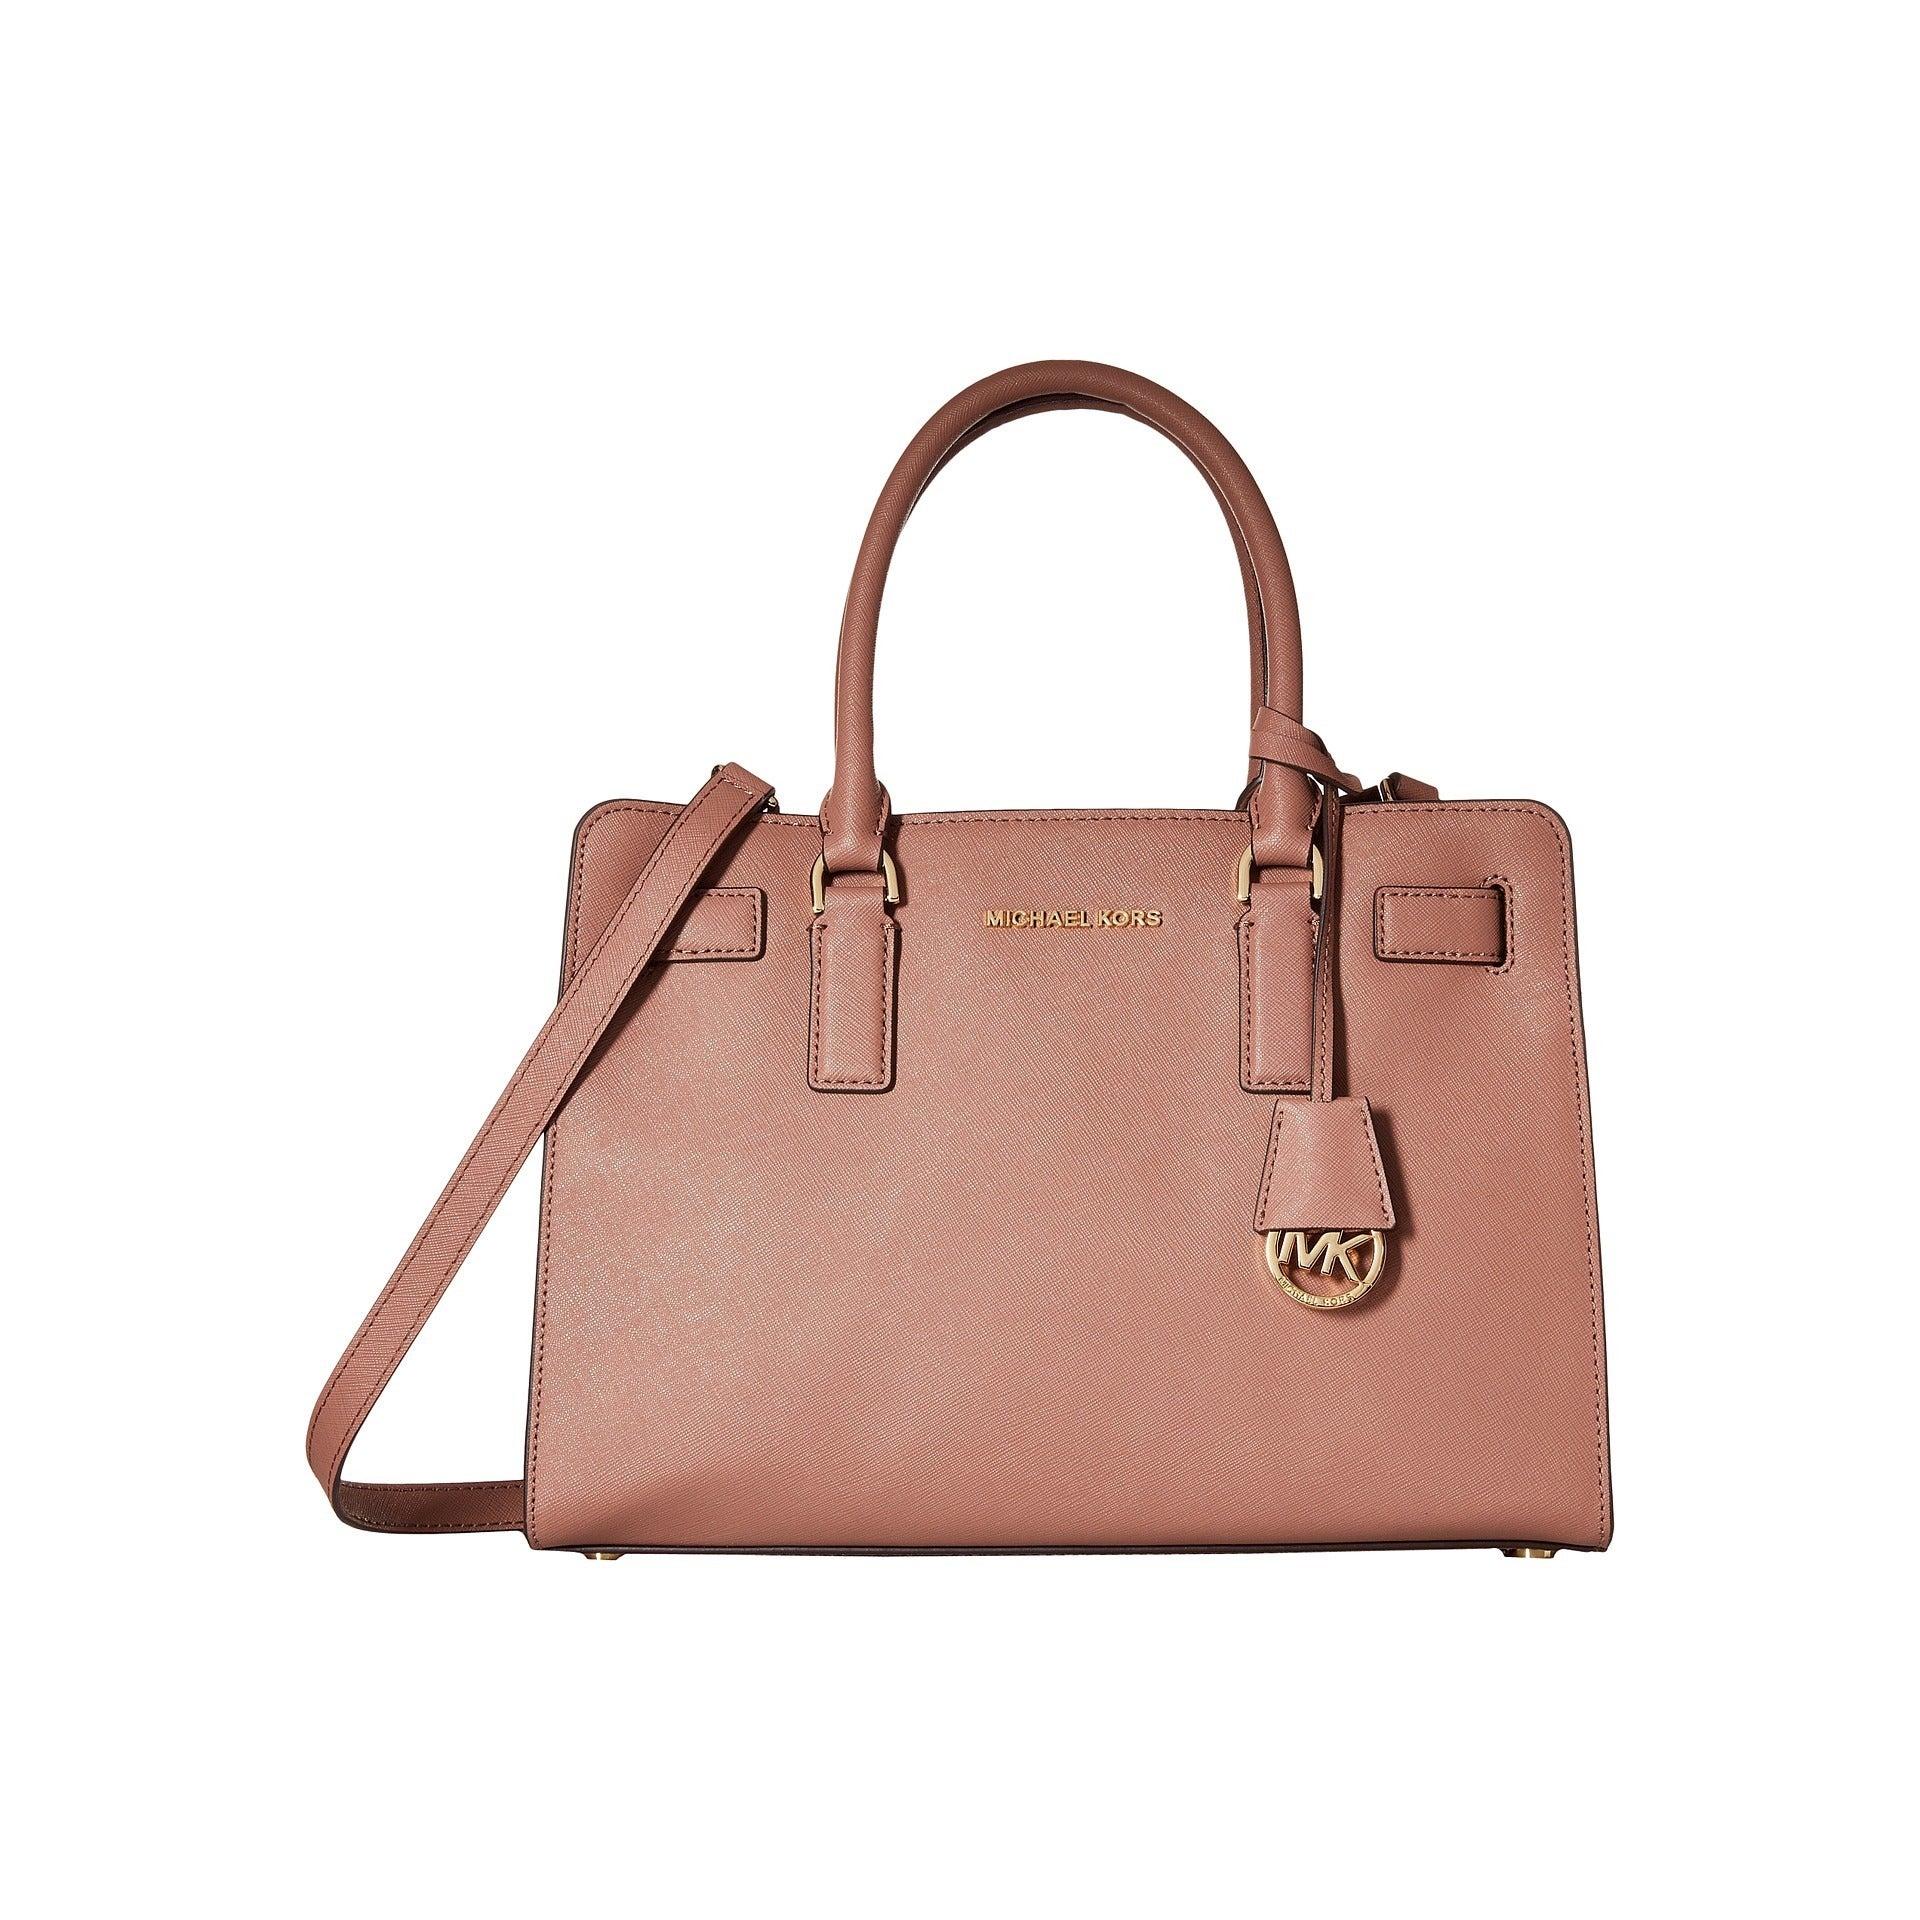 05404070eb97fd Shop Michael Kors Dillon Dusty Rose East/West Satchel Handbag - Free ...